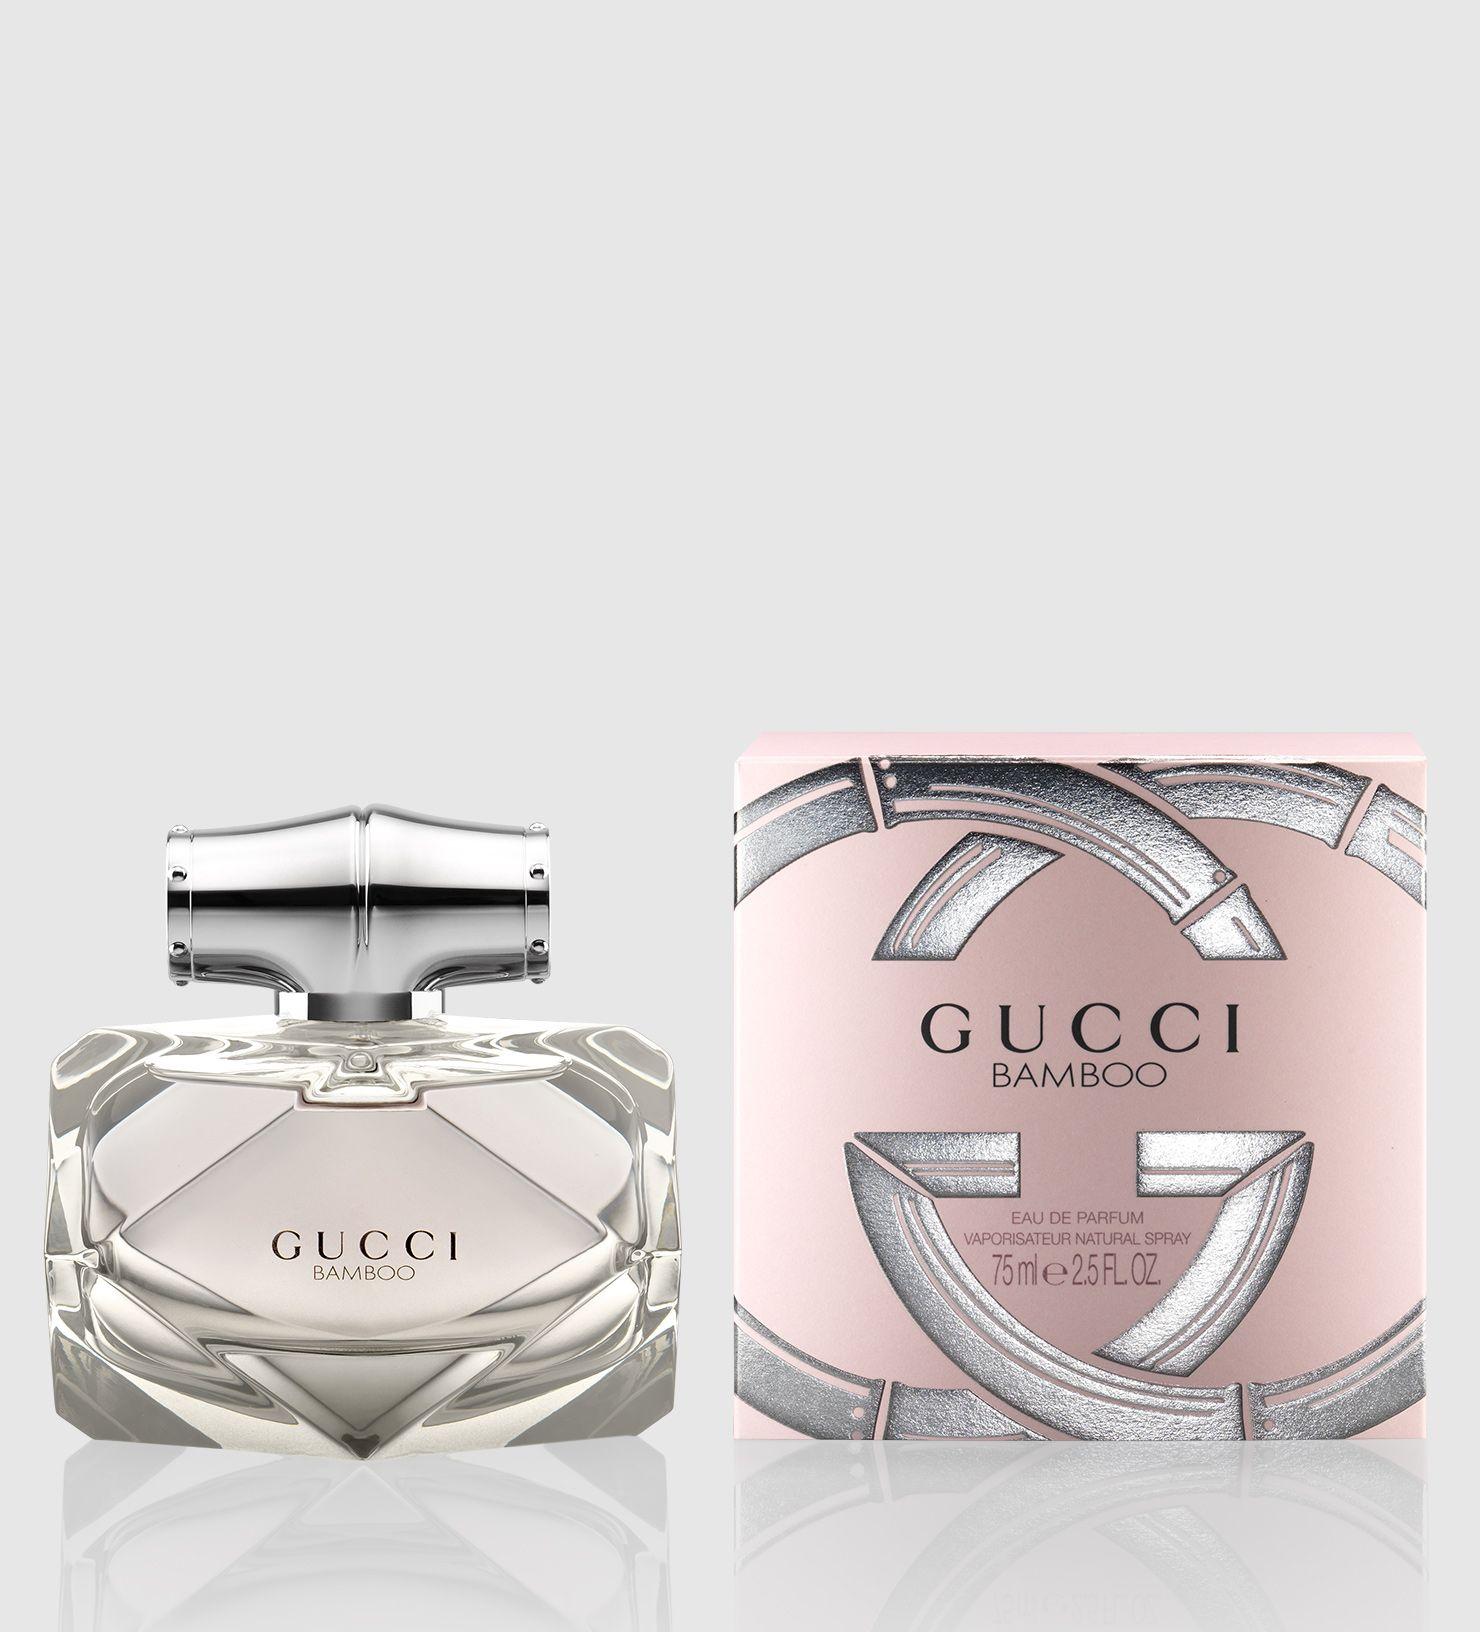 Gucci Bamboo 75ml Eau De Parfum Fragrances Perfume Fragancia